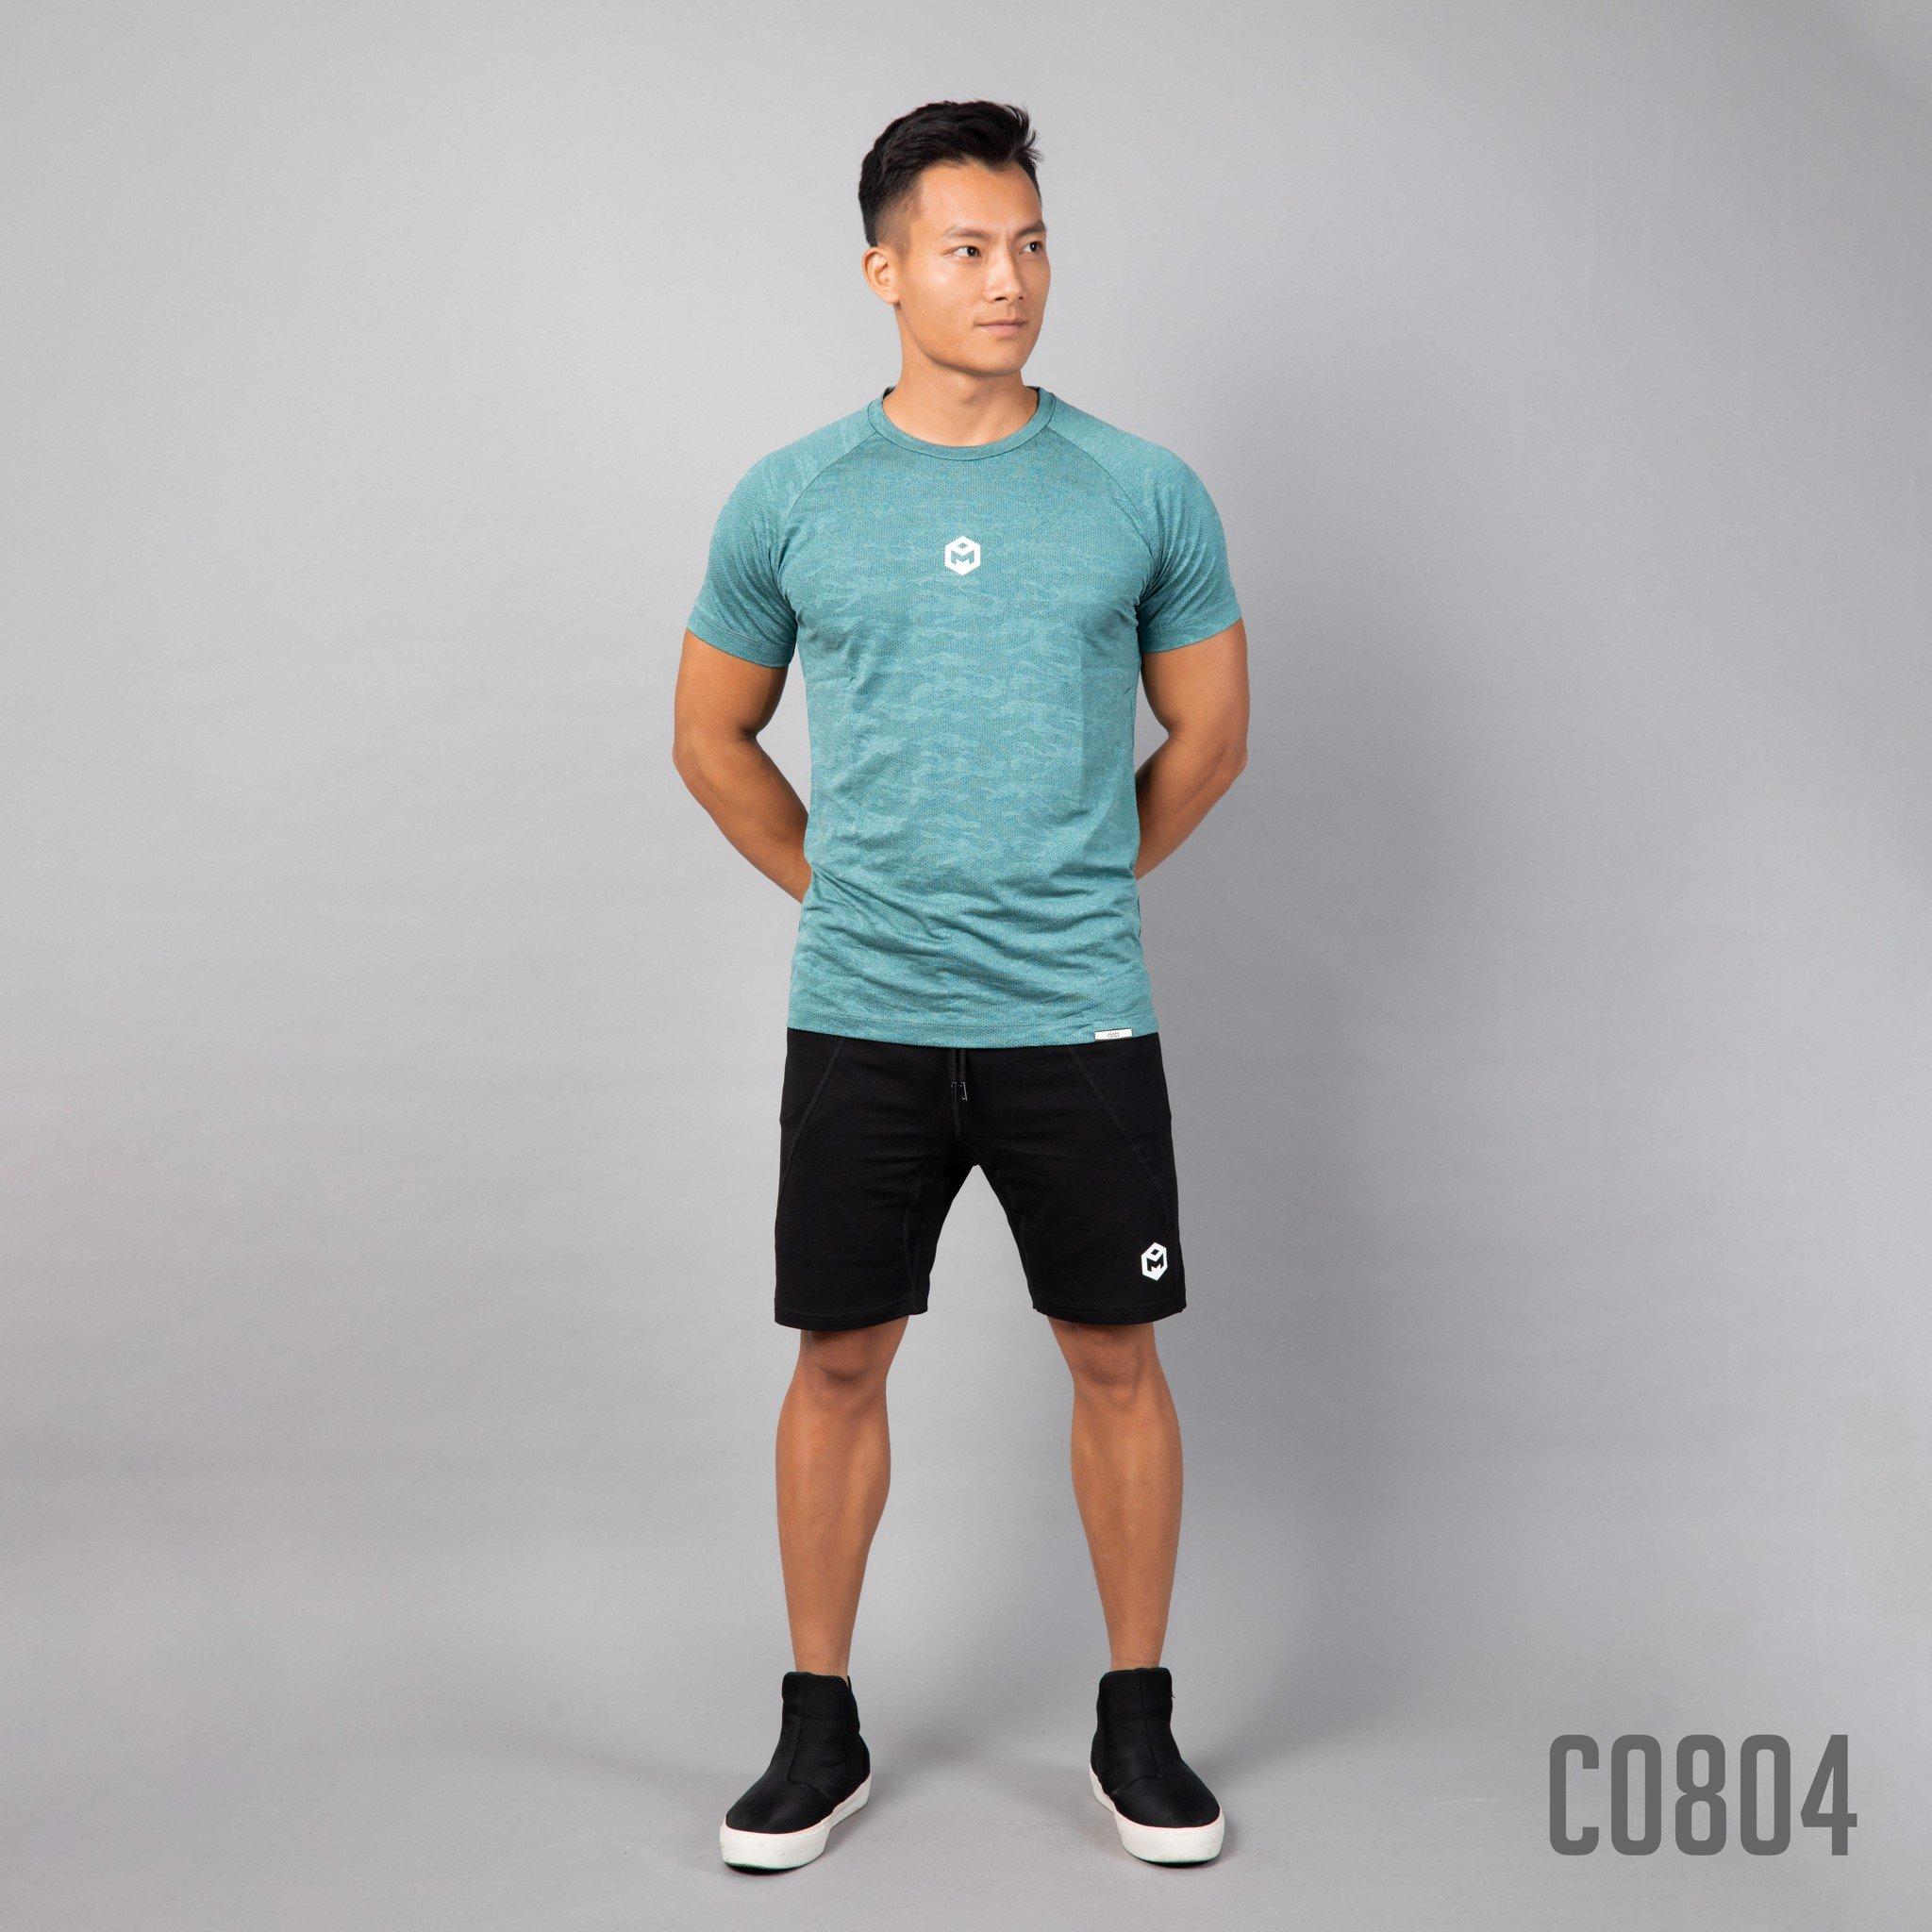 C0804 - Xanh Lá  - Cộc Tay Camo